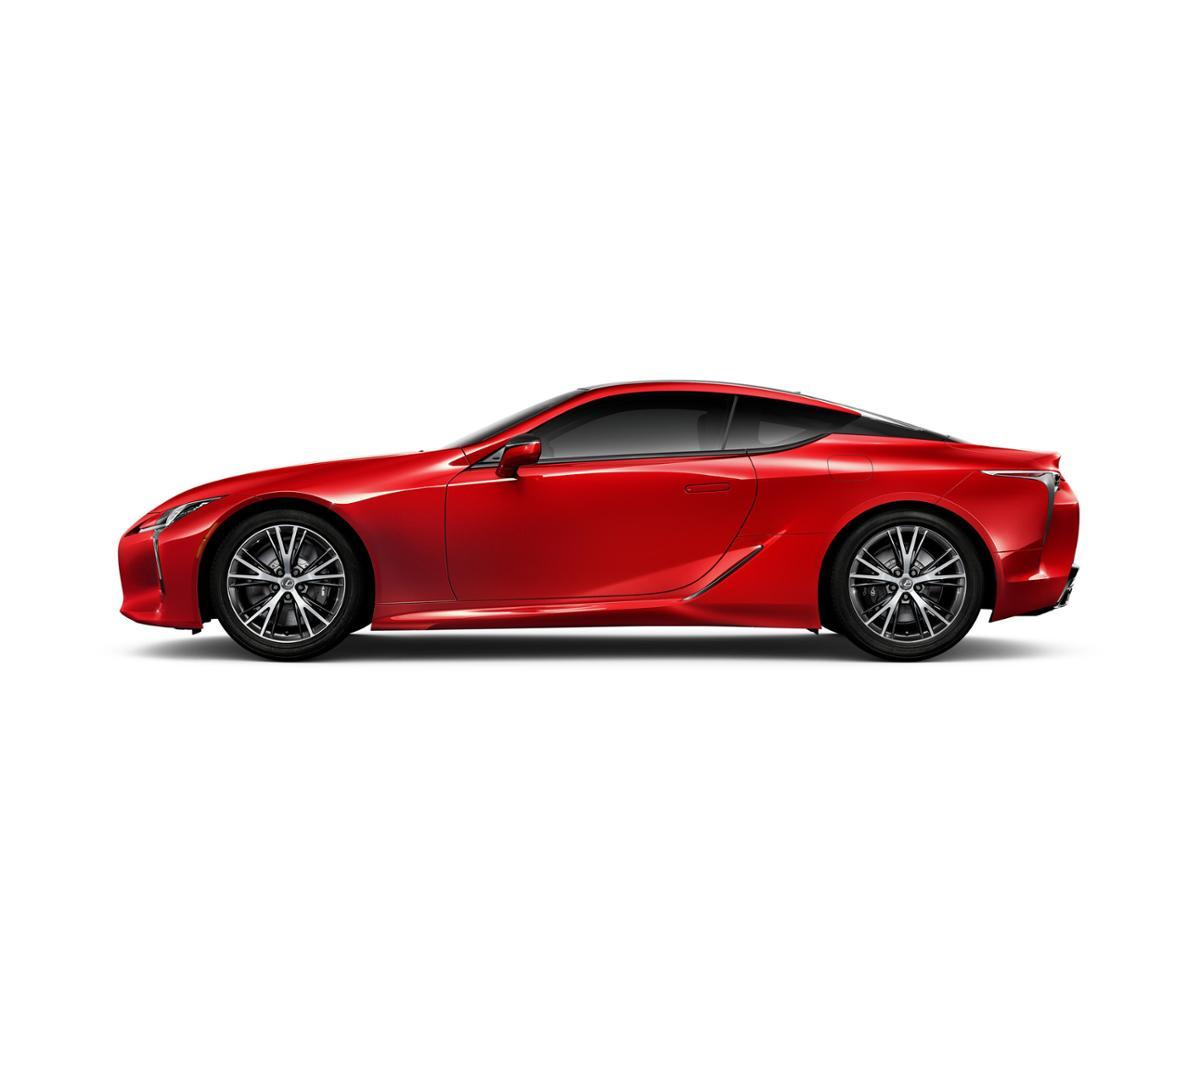 2019 Lexus Lc: New Infrared[INFRARED17] 2019 Lexus LC 500 In West Palm